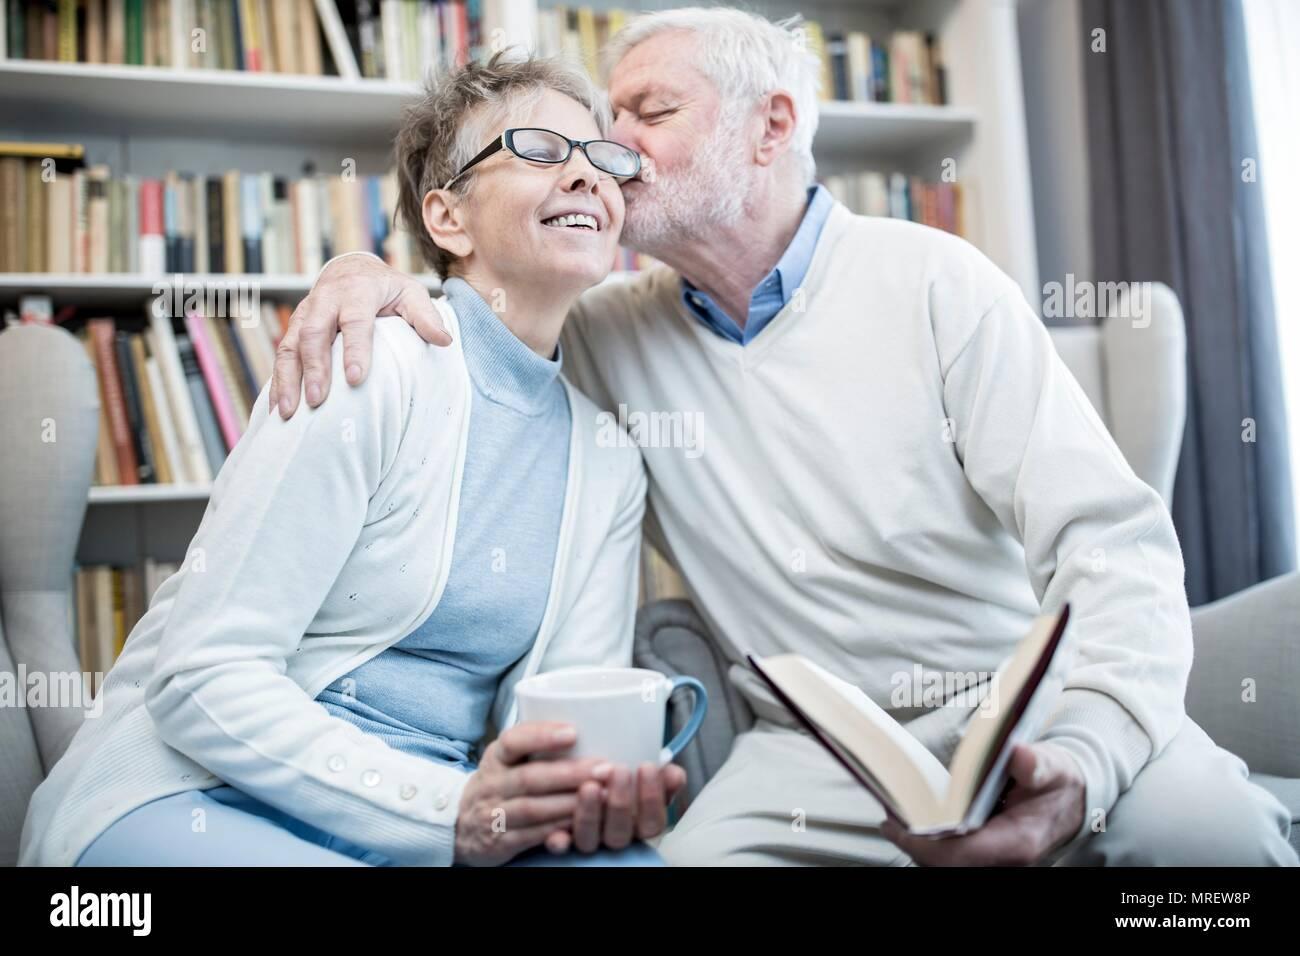 Senior man kissing woman on cheek with arm around her. - Stock Image